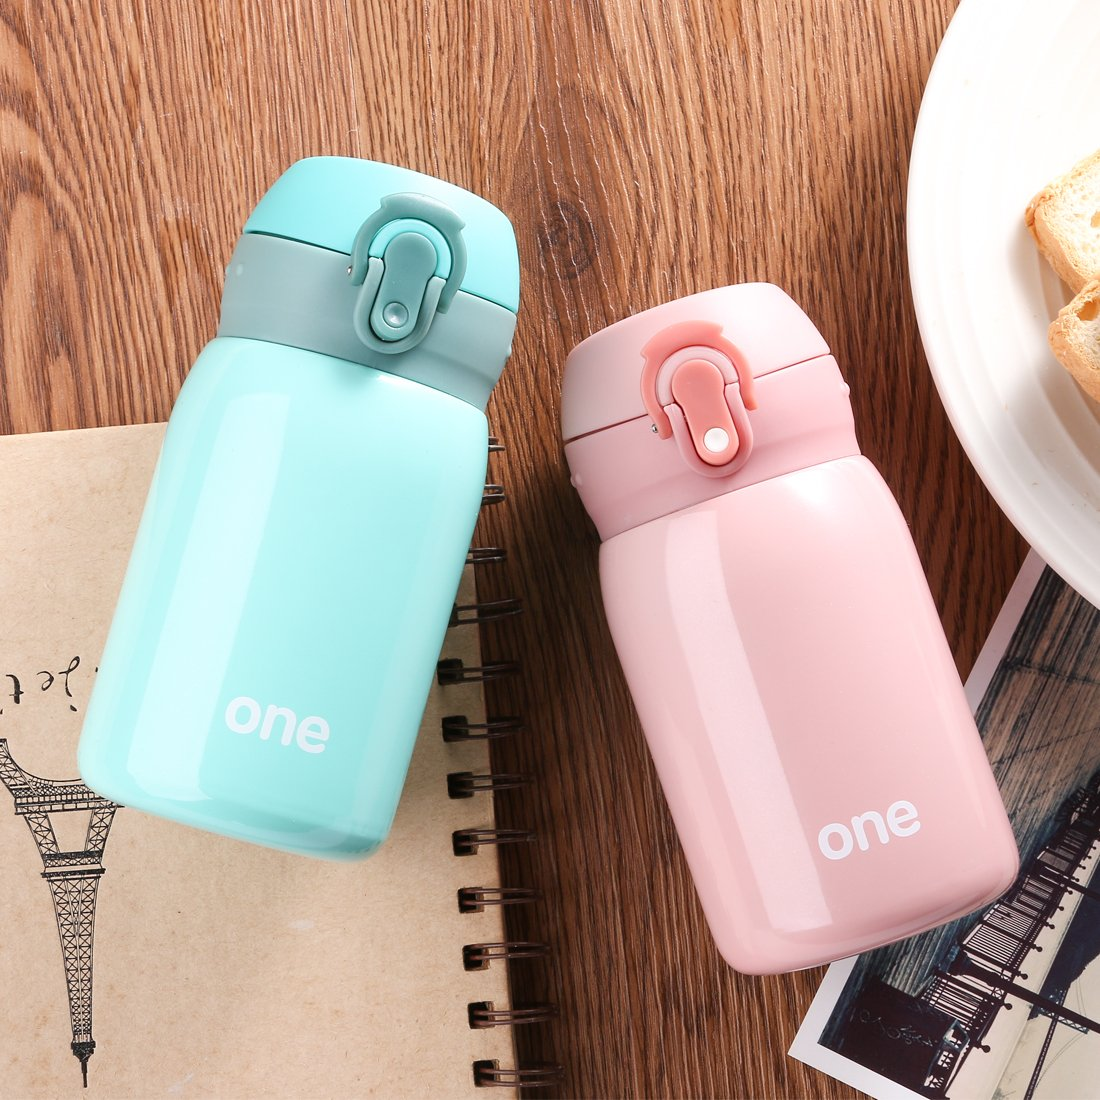 Kid&Girls 260ml/9oz Mini Insulated Water Bottle Drink Thermos Cute Stainless Steel Vacuum Flask,Leak-proof Travel Mug Coffee Tumbler (Green) by HOLD U FUN (Image #9)